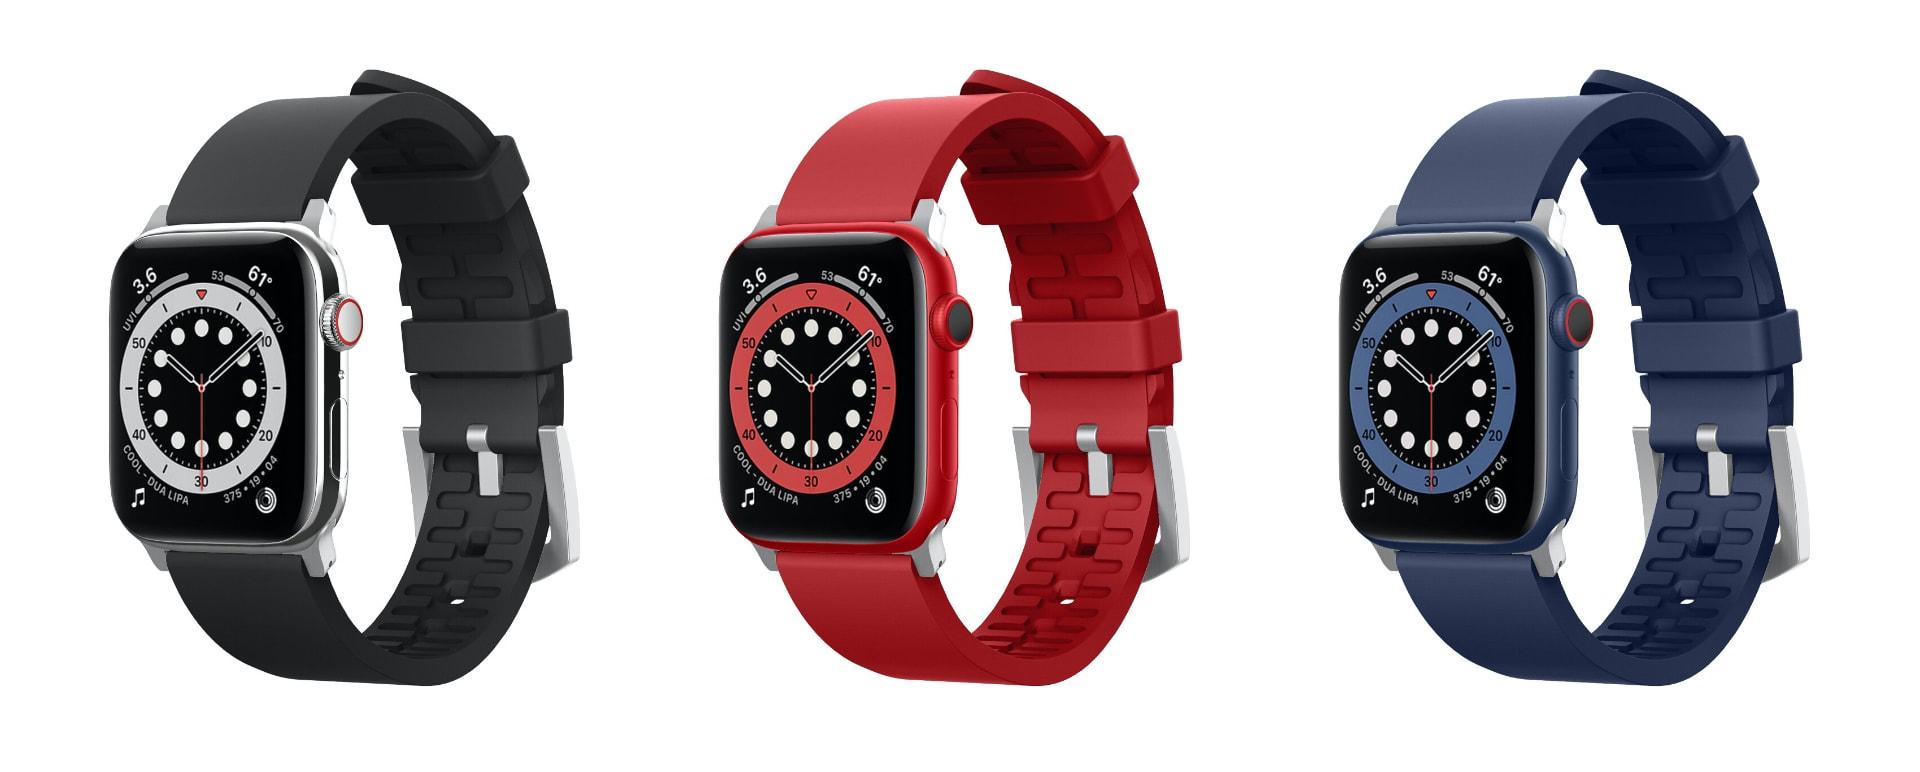 Elago Premium Apple Watch band